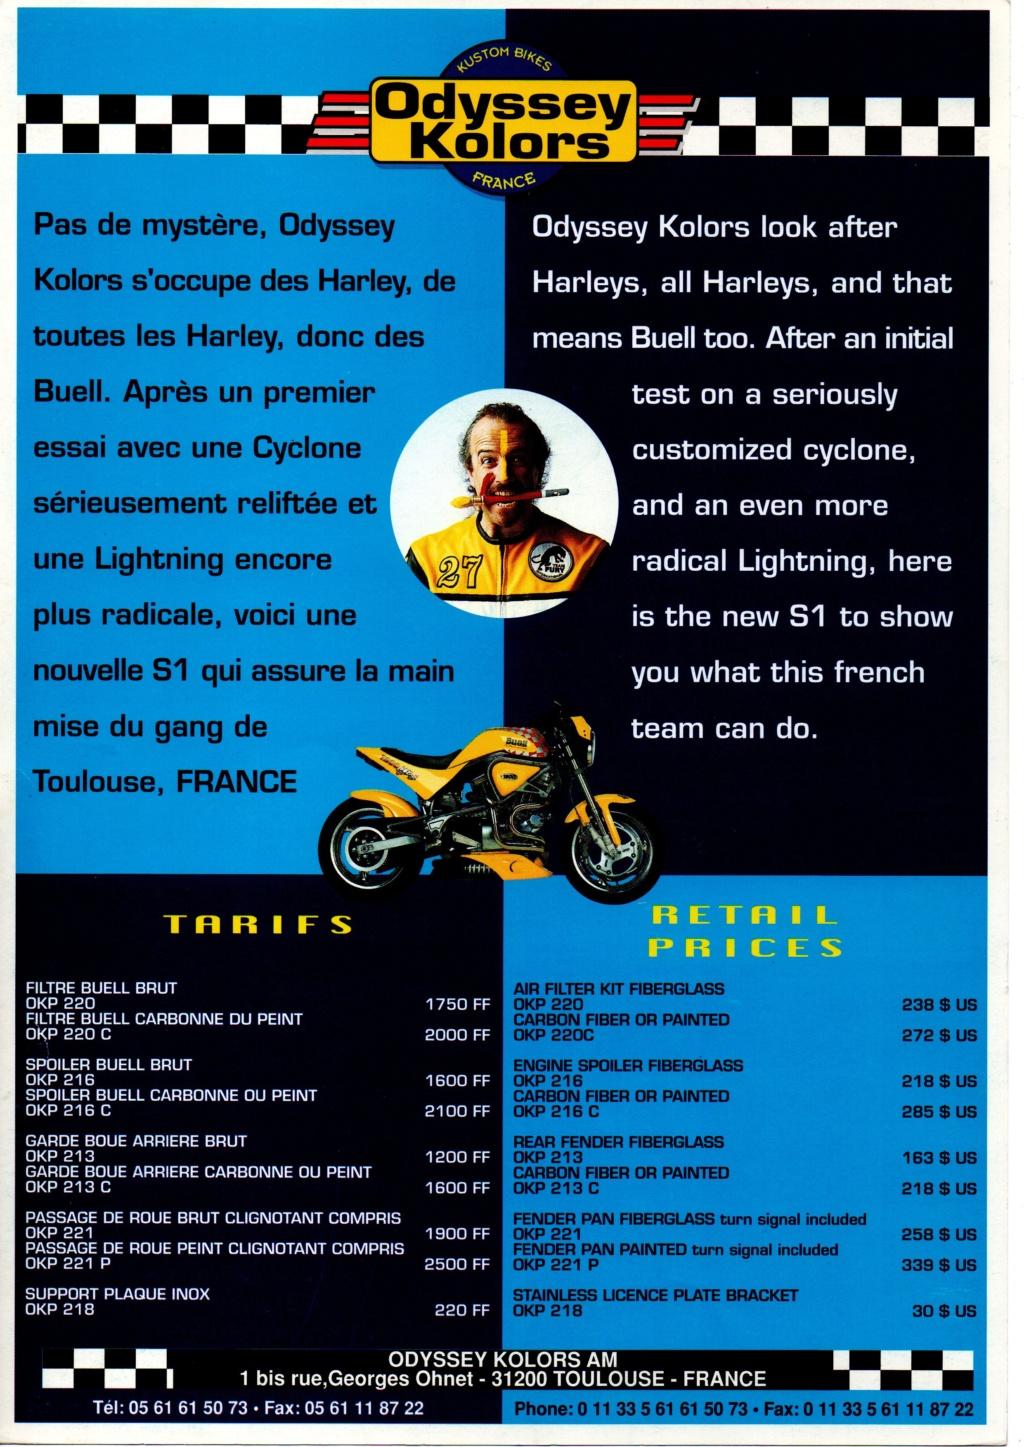 Buell S1 Lightning 97 Odyssey Kolors : l'histoire Scan2012